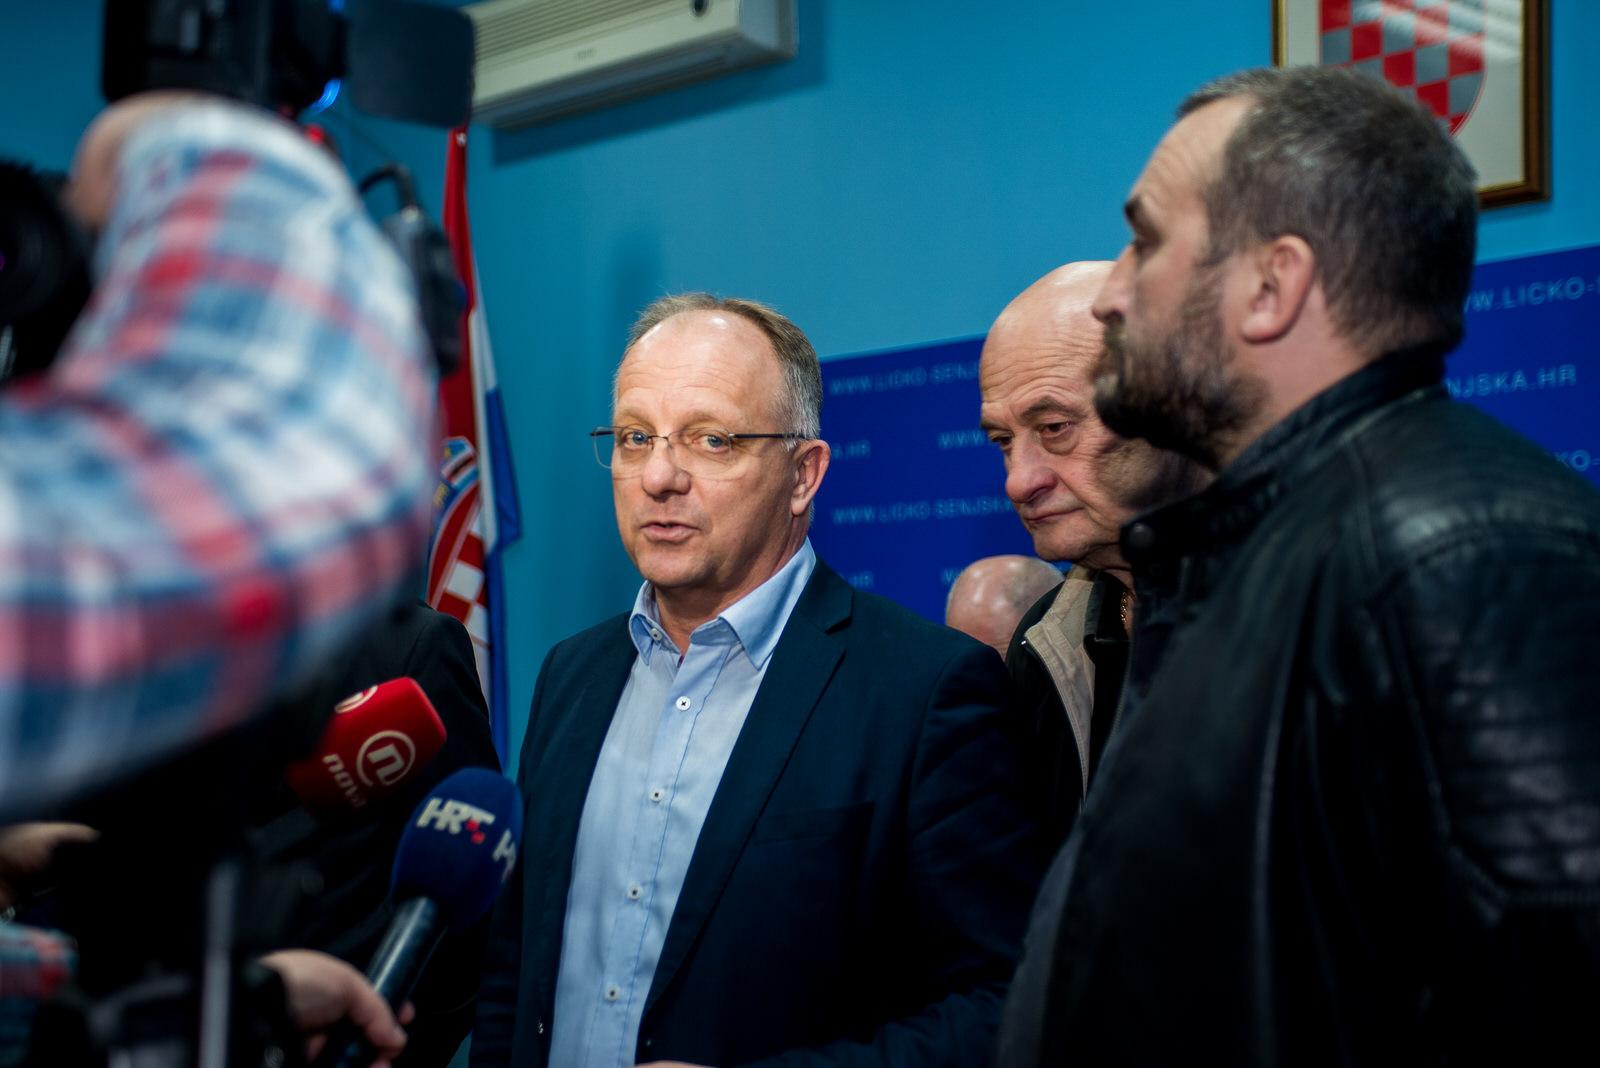 likaclub_politika-gospić_2019_bura-promjena-20